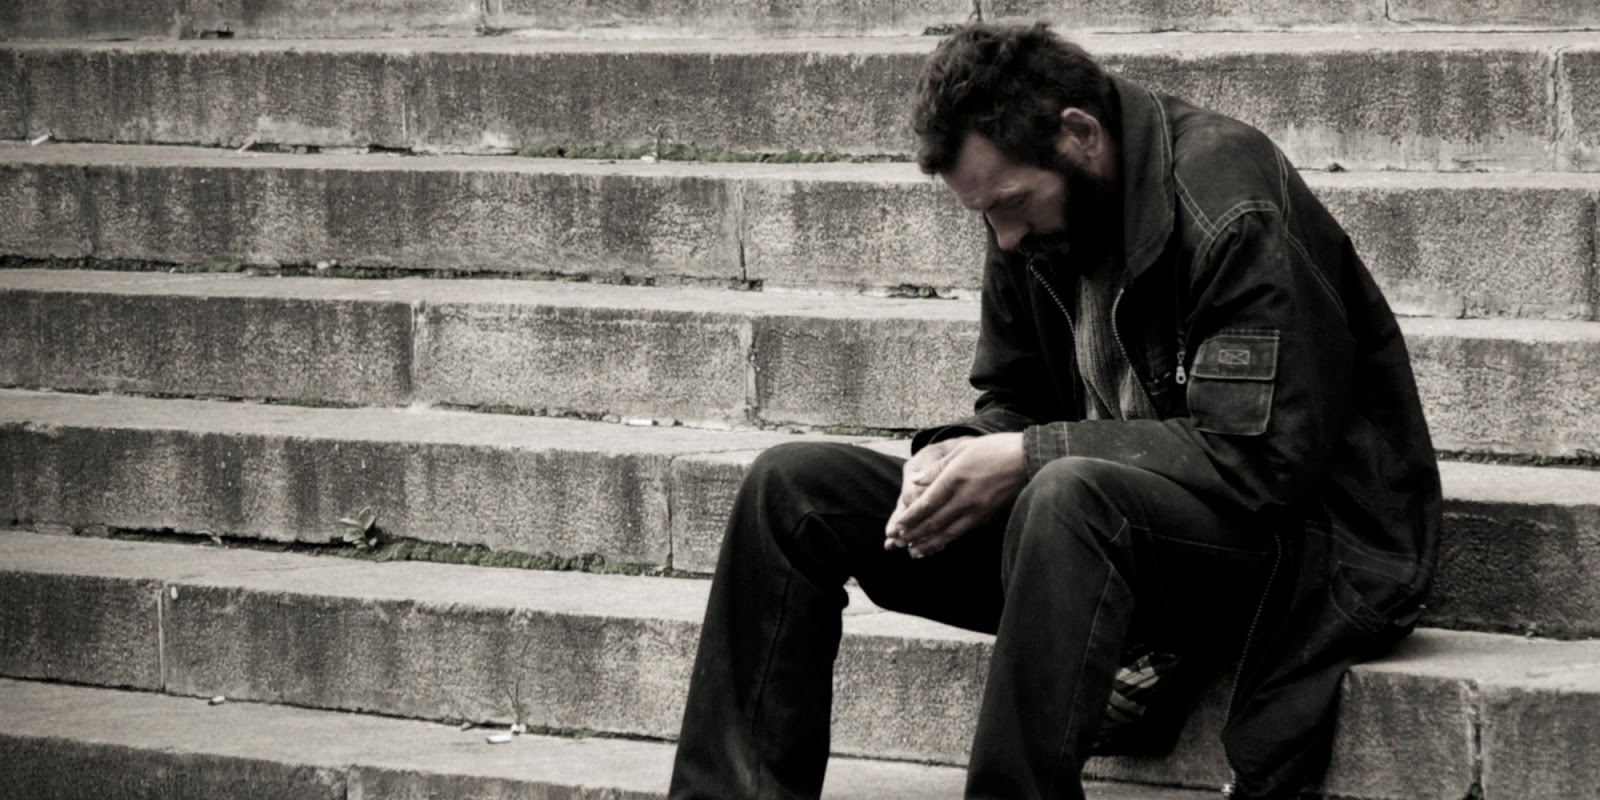 Eastern Orthodox Spirituality: We Should Not Despair Even ...